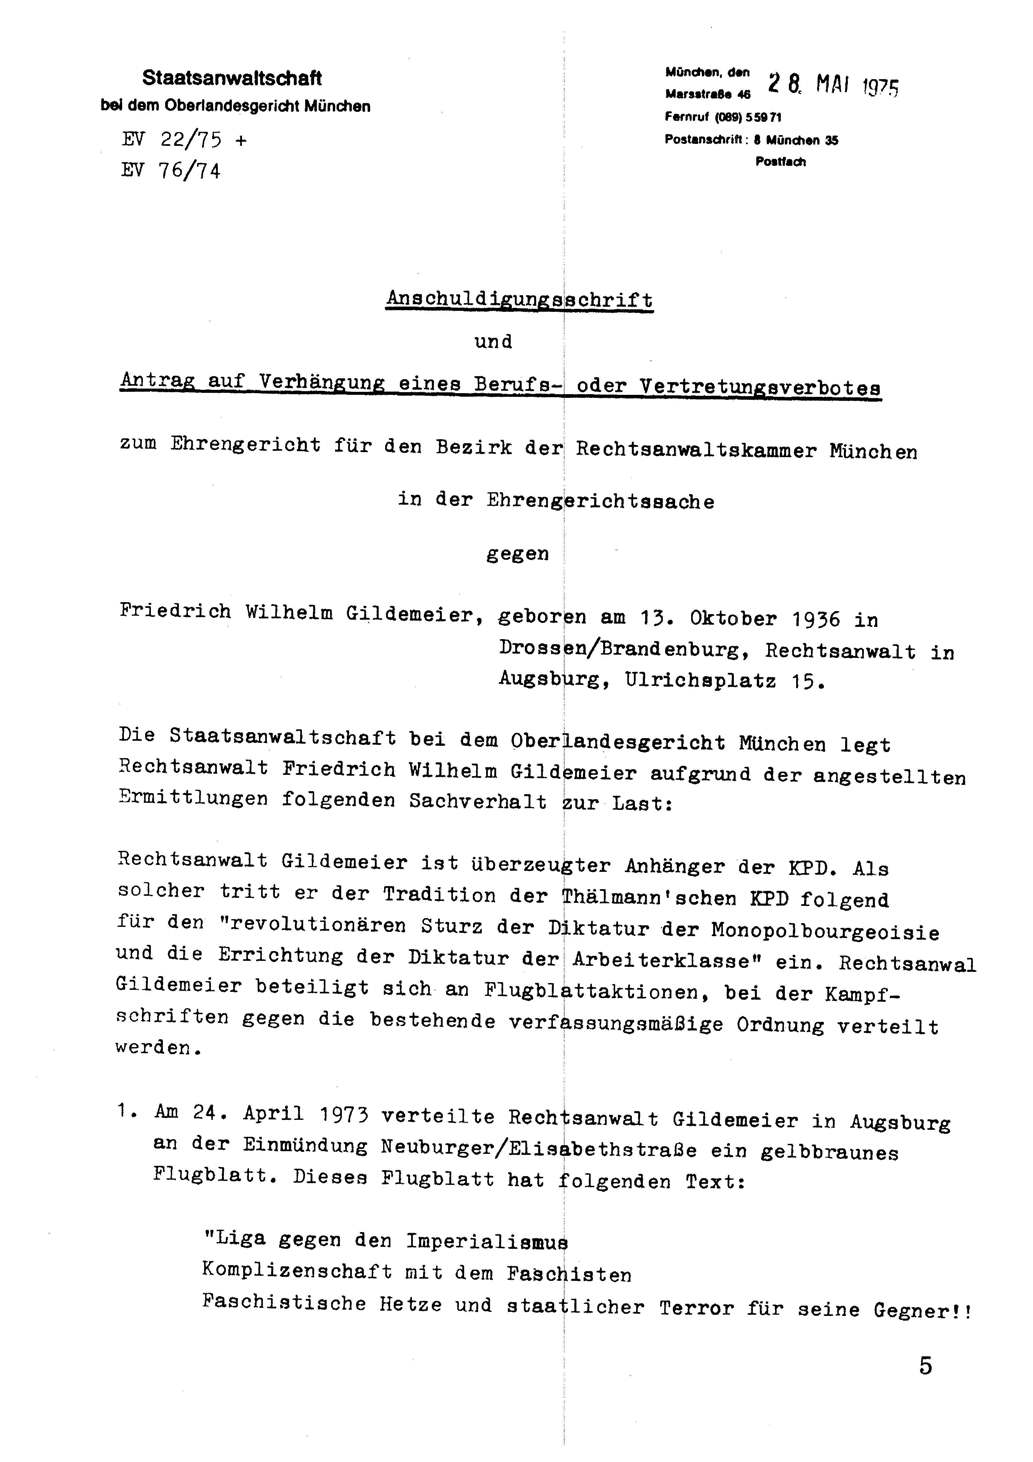 RHeV_Anschuldigung_RA_Gildemeier_Seite_05